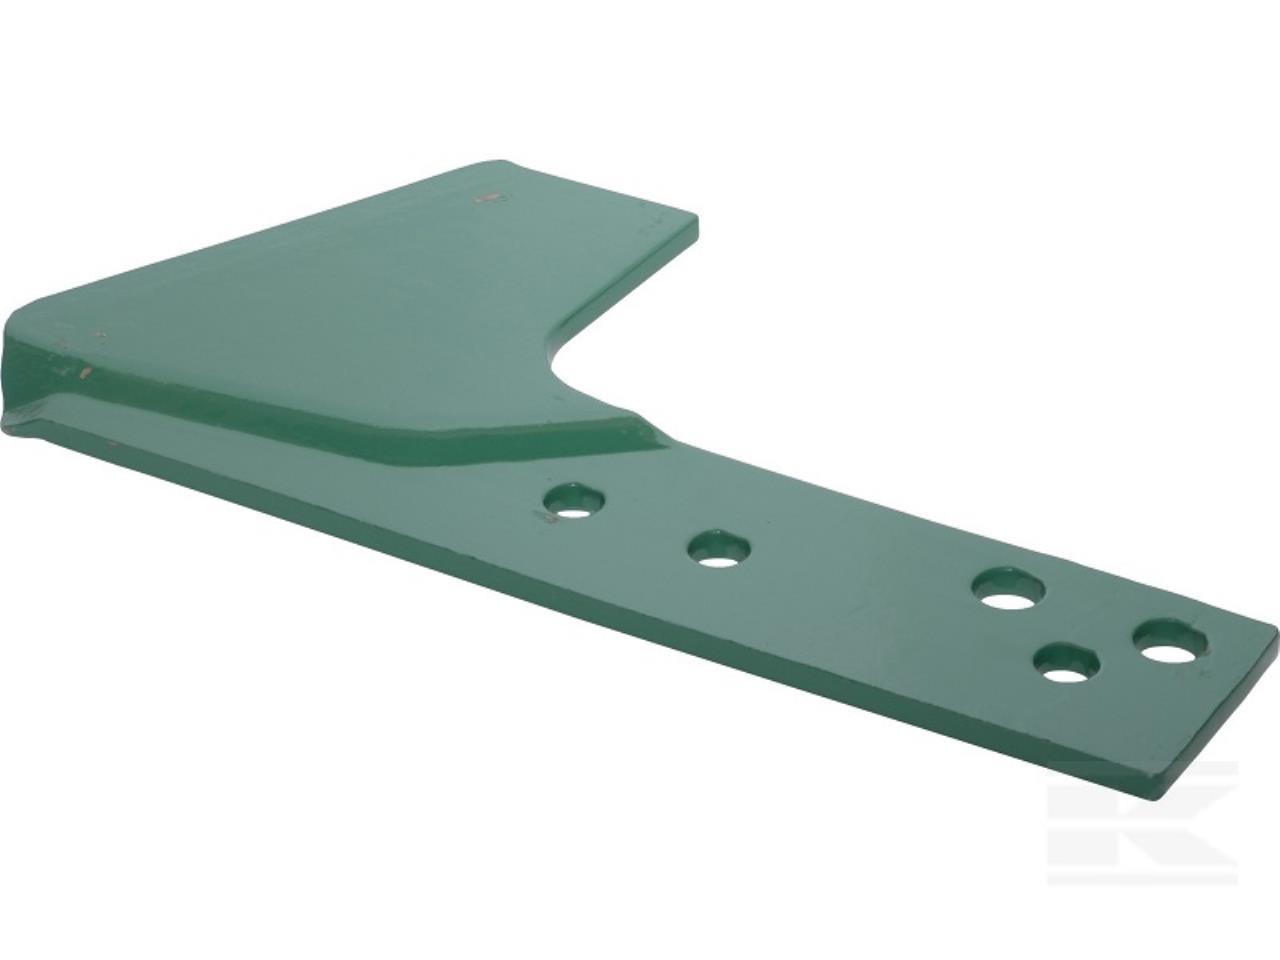 Landsidekniv, højre u/bolte (KK083340R)